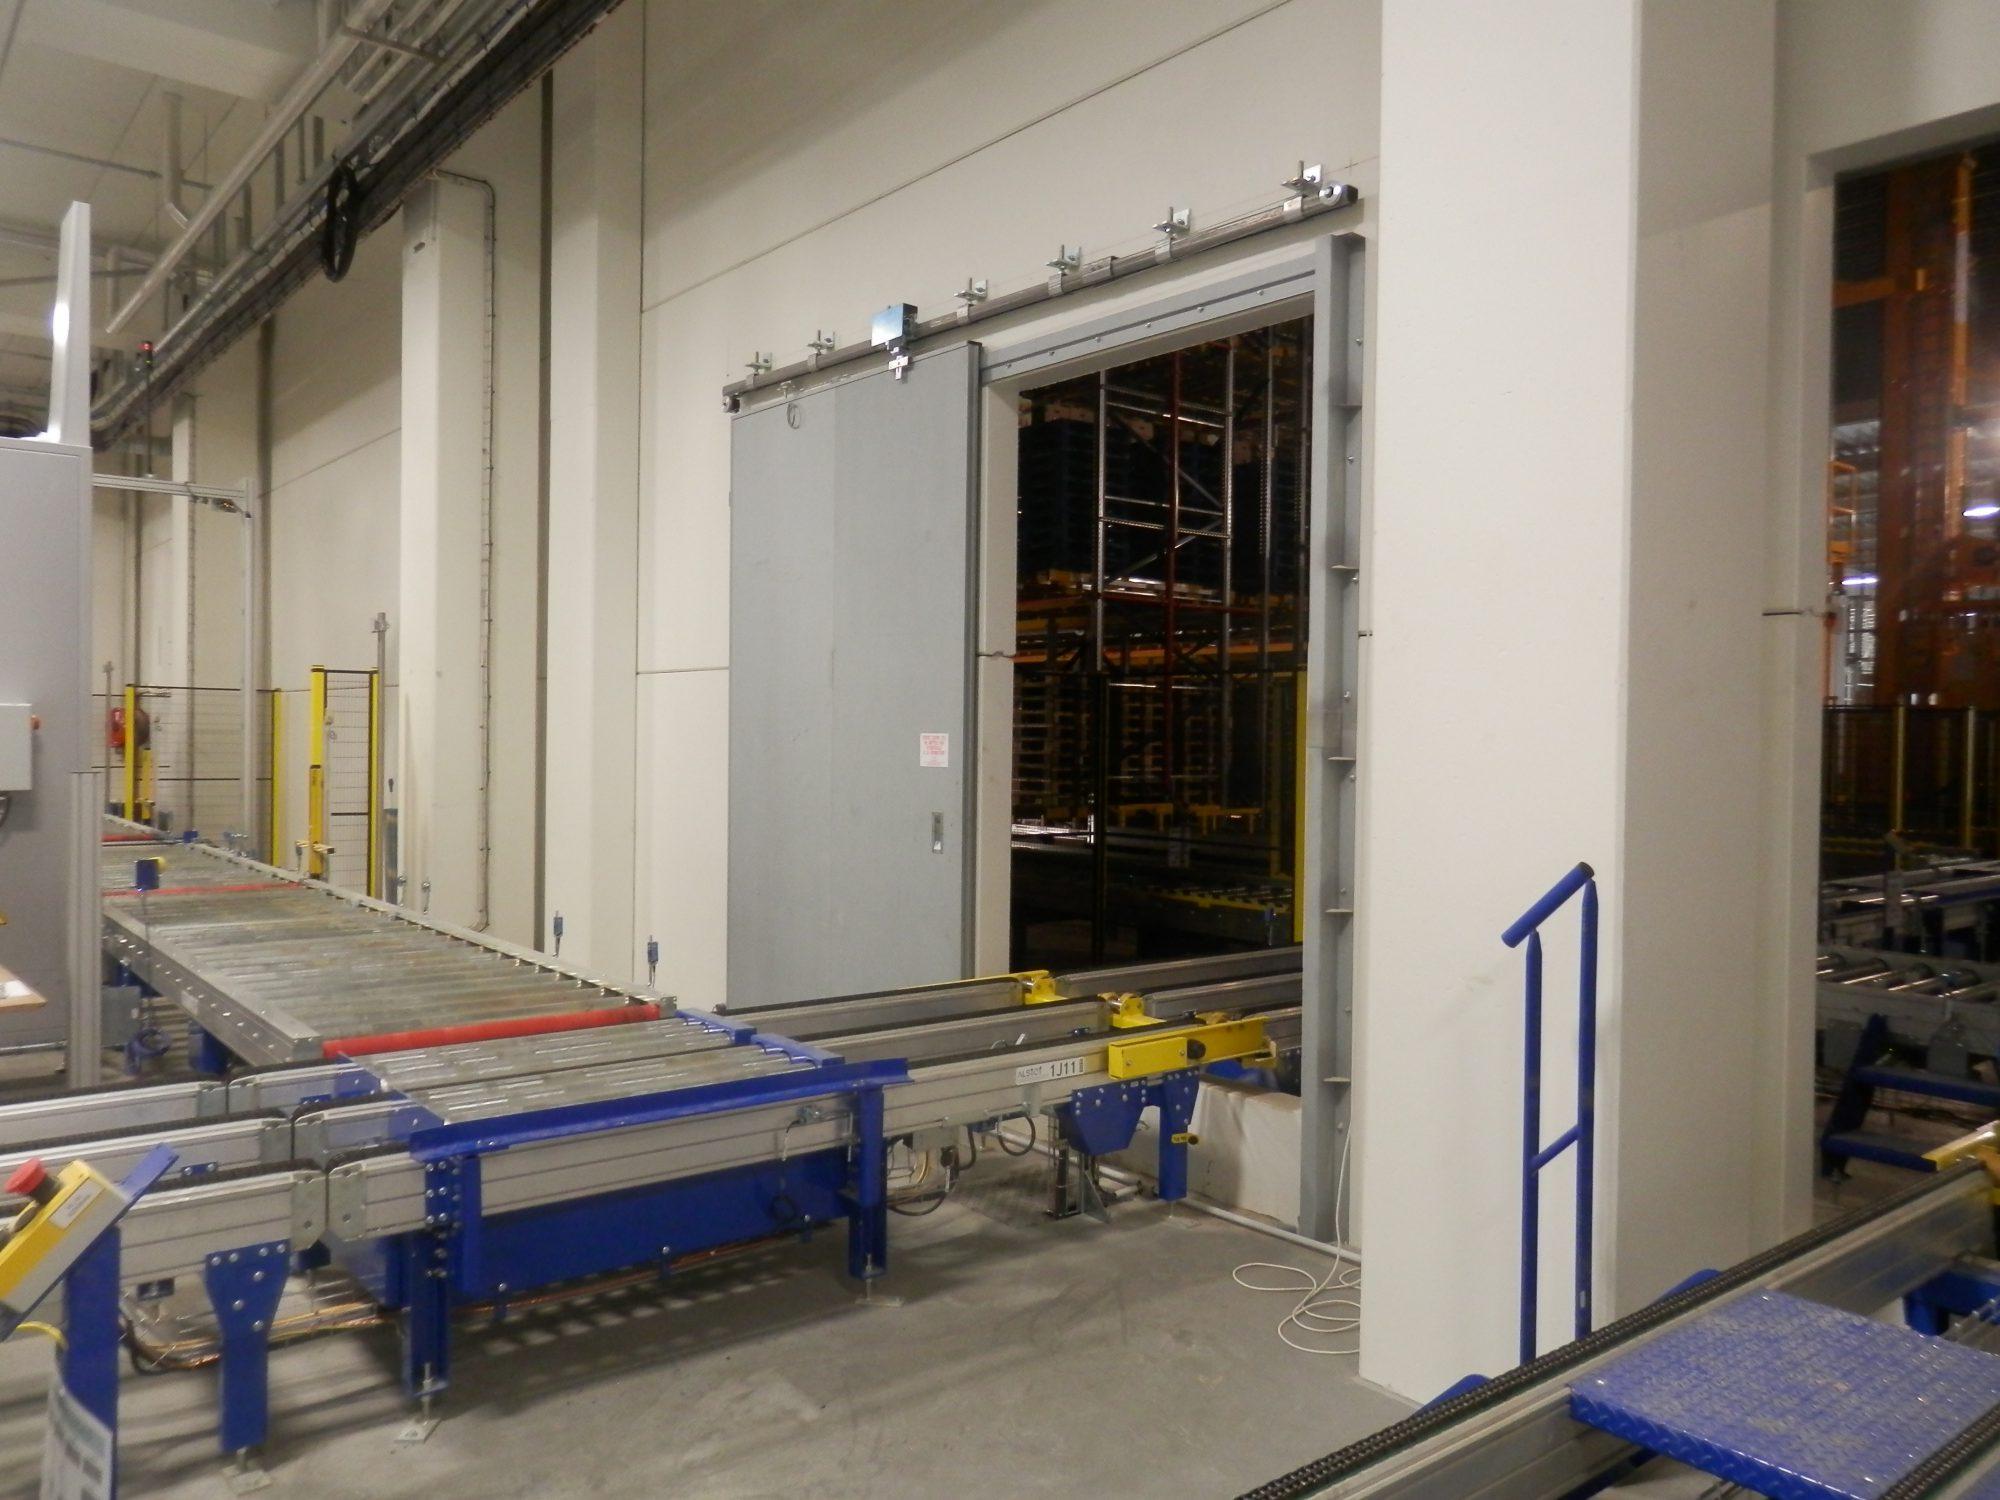 Porte coupe feu 2 heures coulissantes somaferm for Installation d une porte coulissante